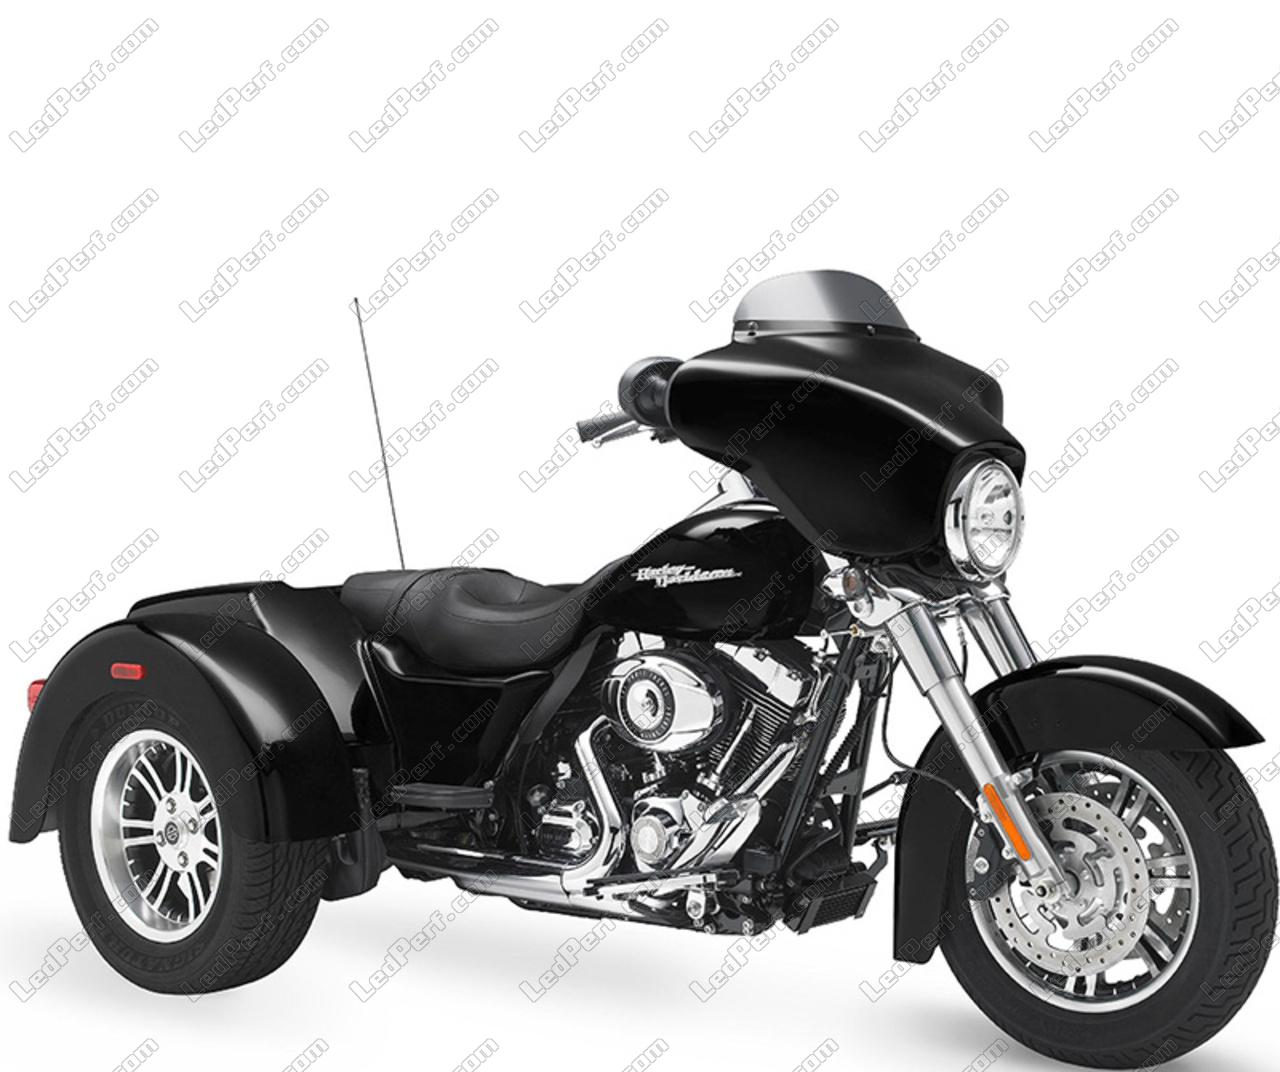 Led Bulbs For Harley Davidson Street Glide Trike 1690